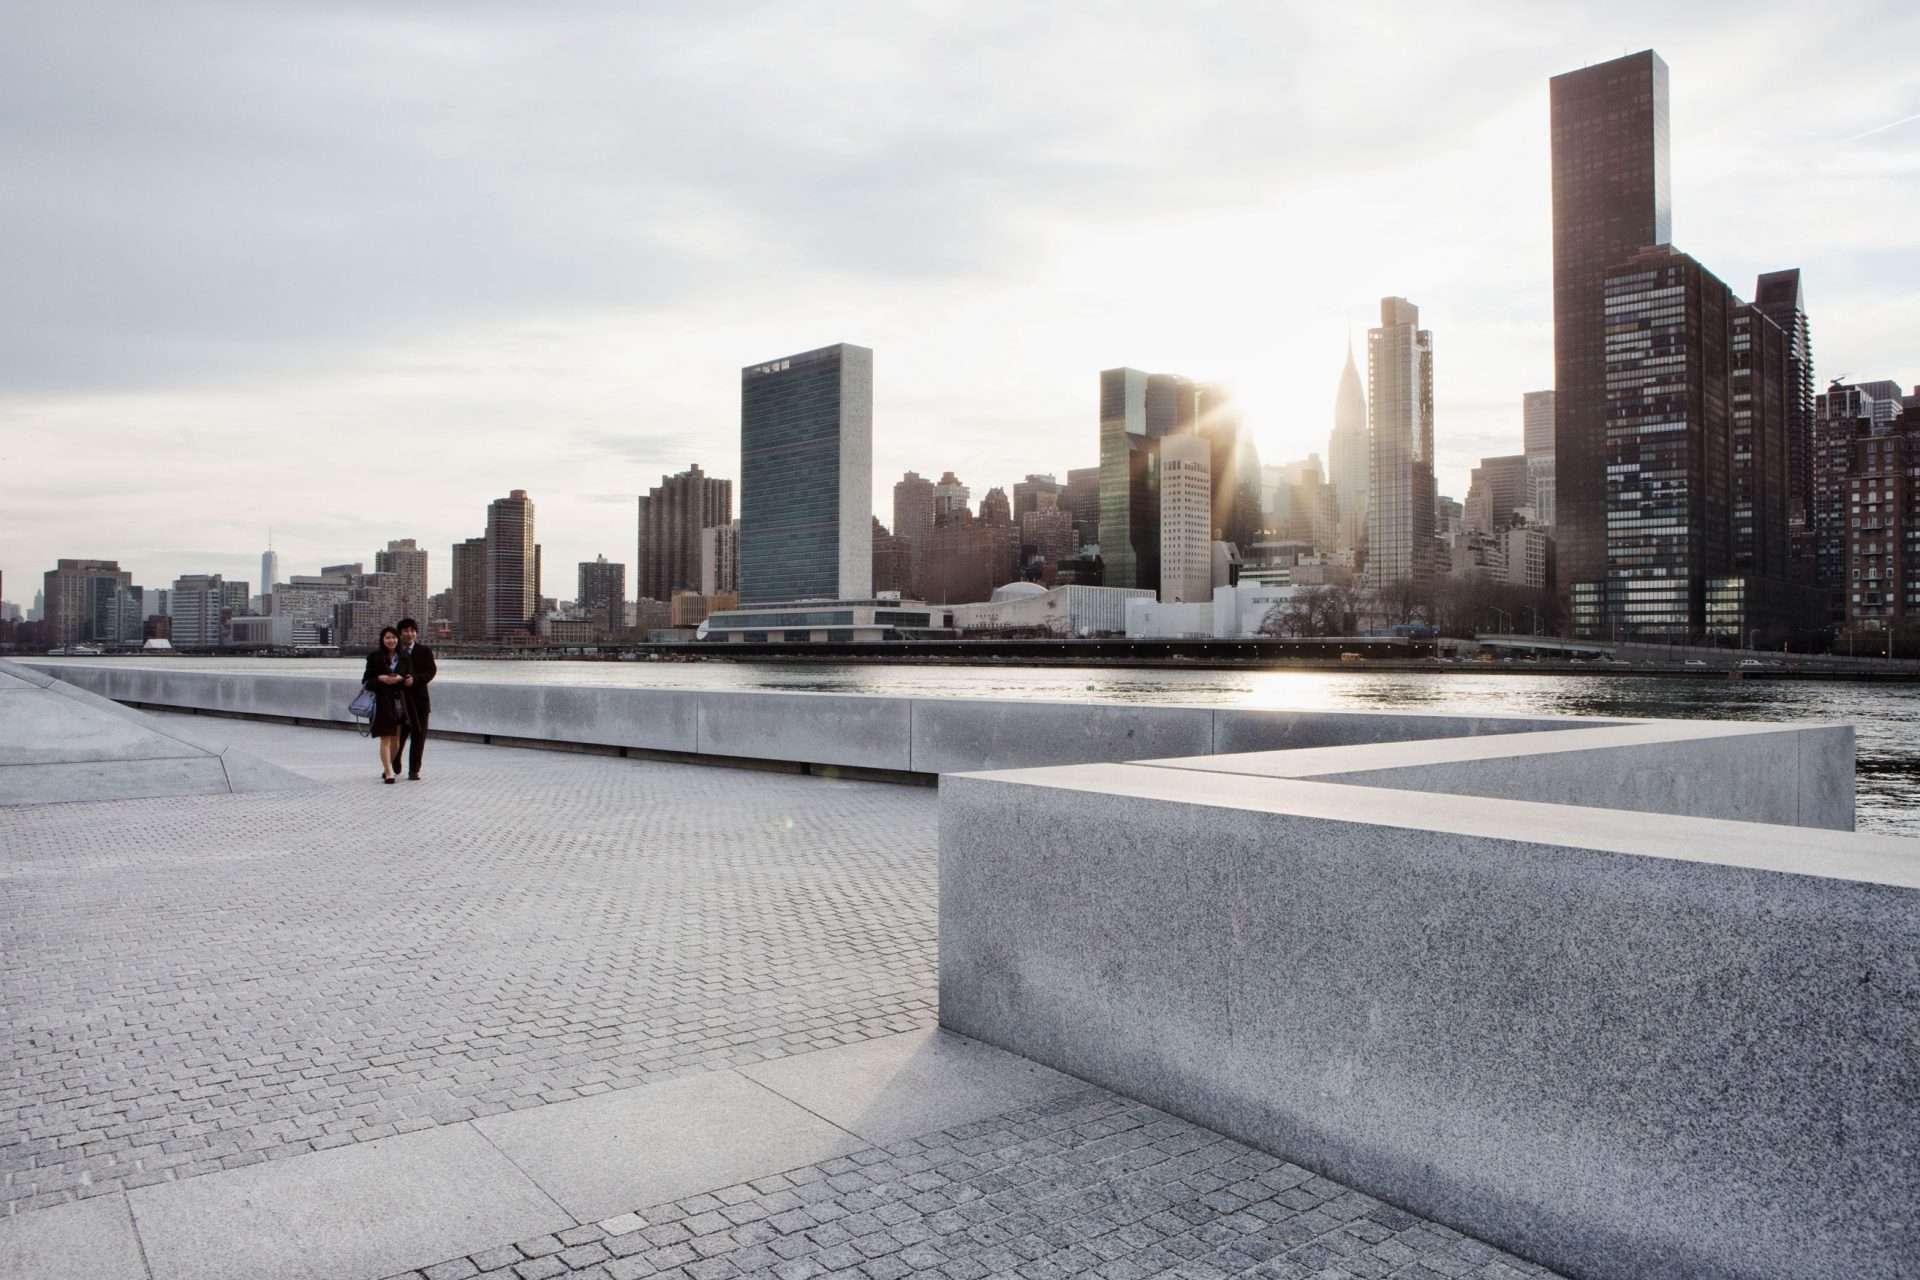 02-simonbosch-photography-simon-bosch-architectuur-architecture-bogota-colombia-New York-Louis Kahn